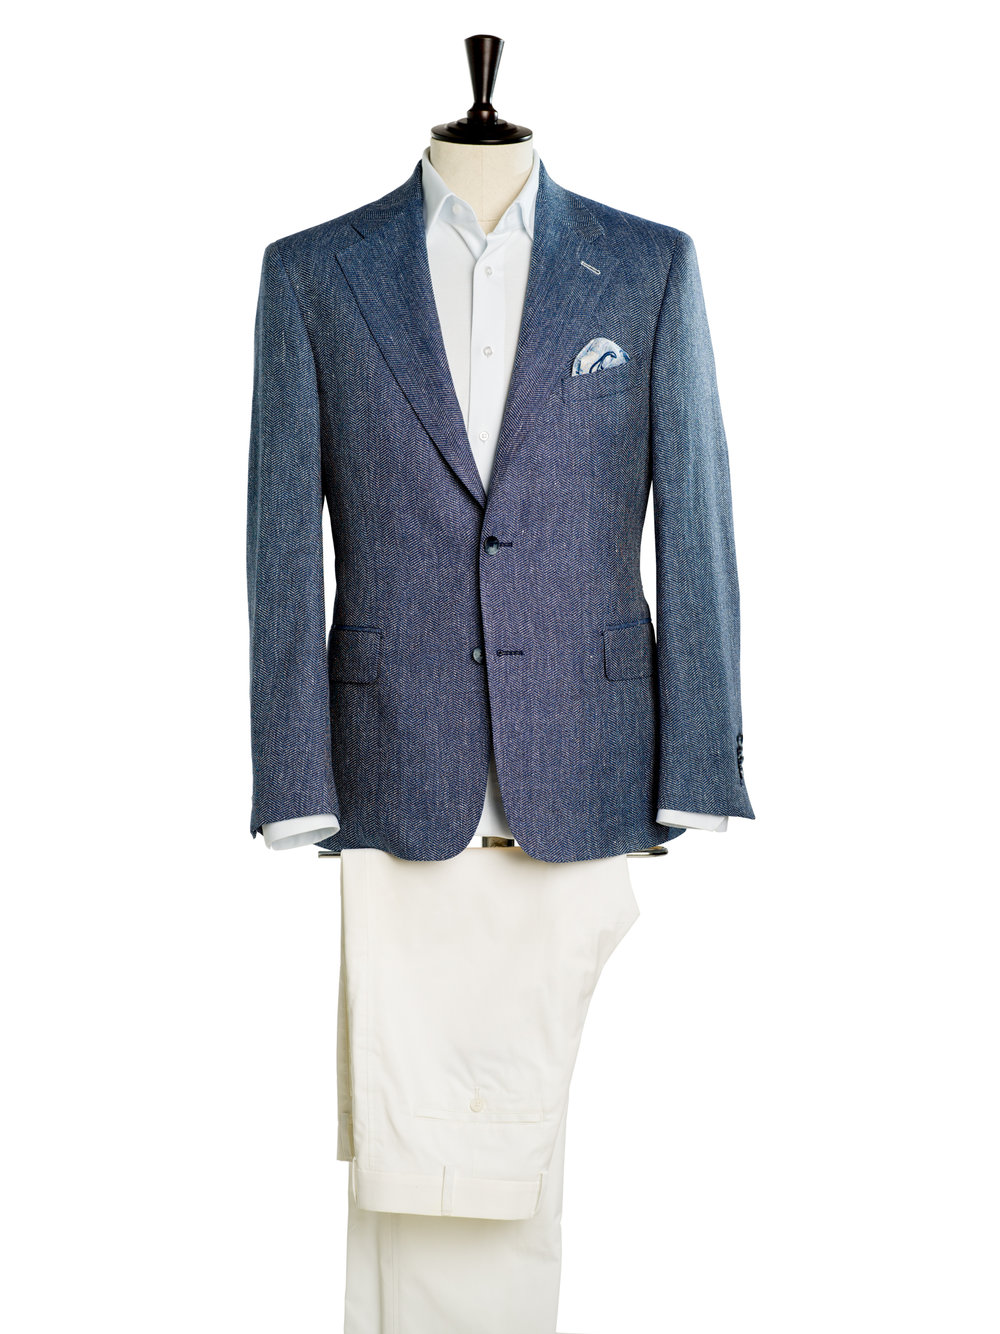 Marine Look blaues Sakko weiße Hose.jpg